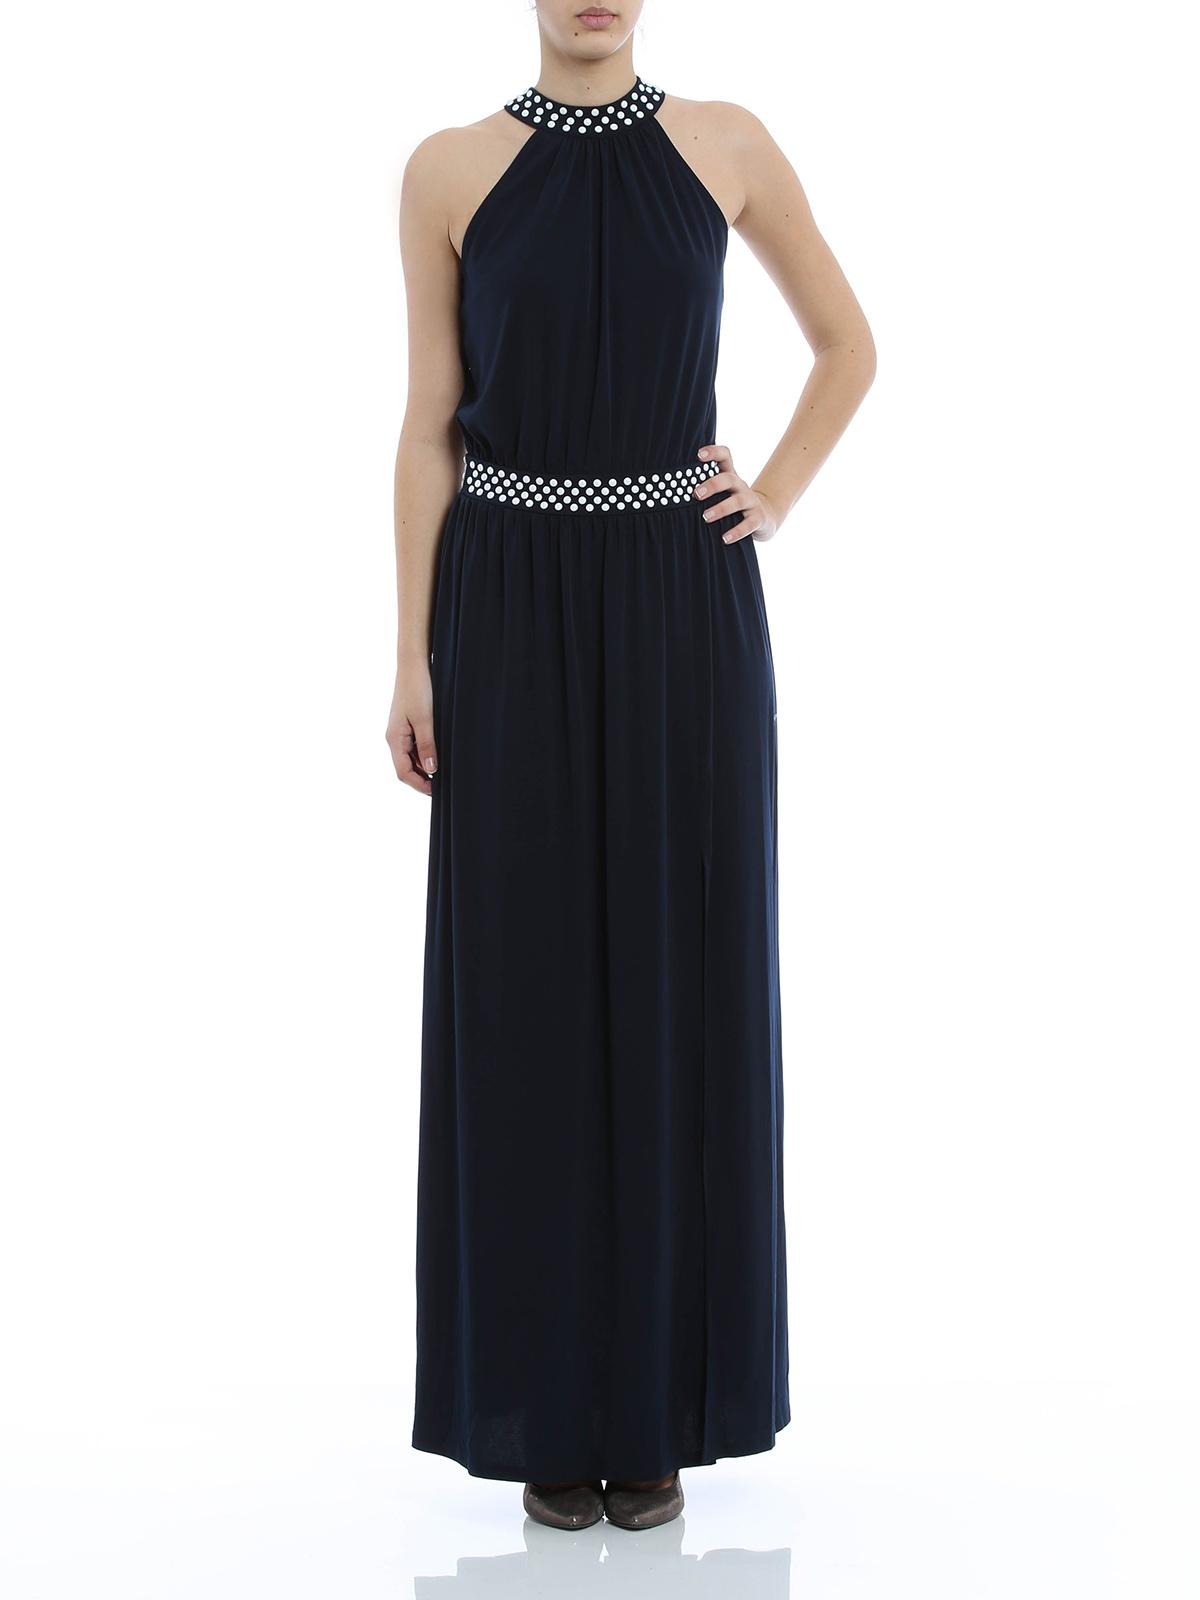 Embellished Maxi Dress By Michael Kors Maxi Dresses Ikrix